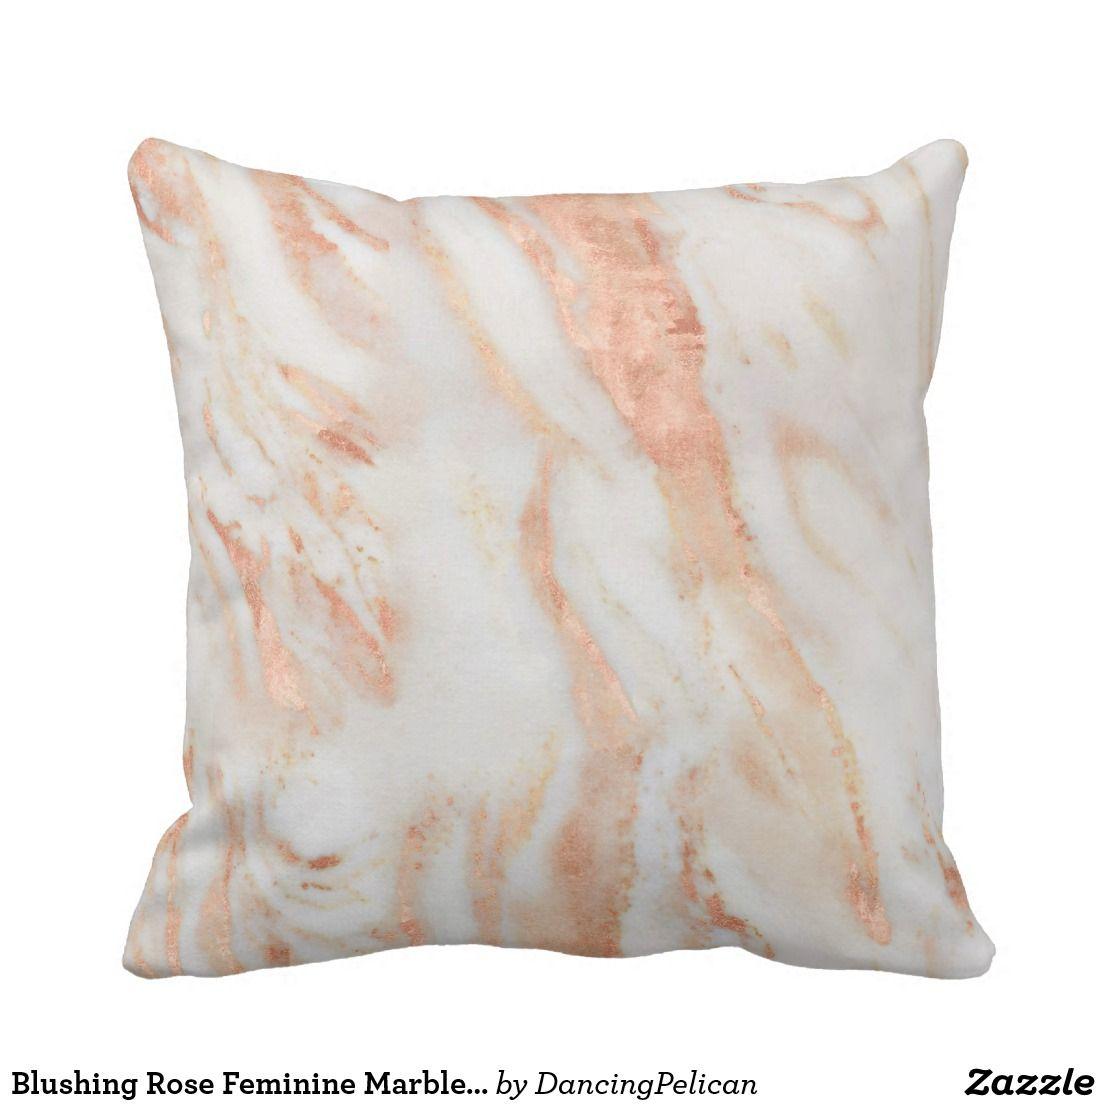 Blushing Rose Feminine Marble Pattern Throw Pillow  c6a5251e2b